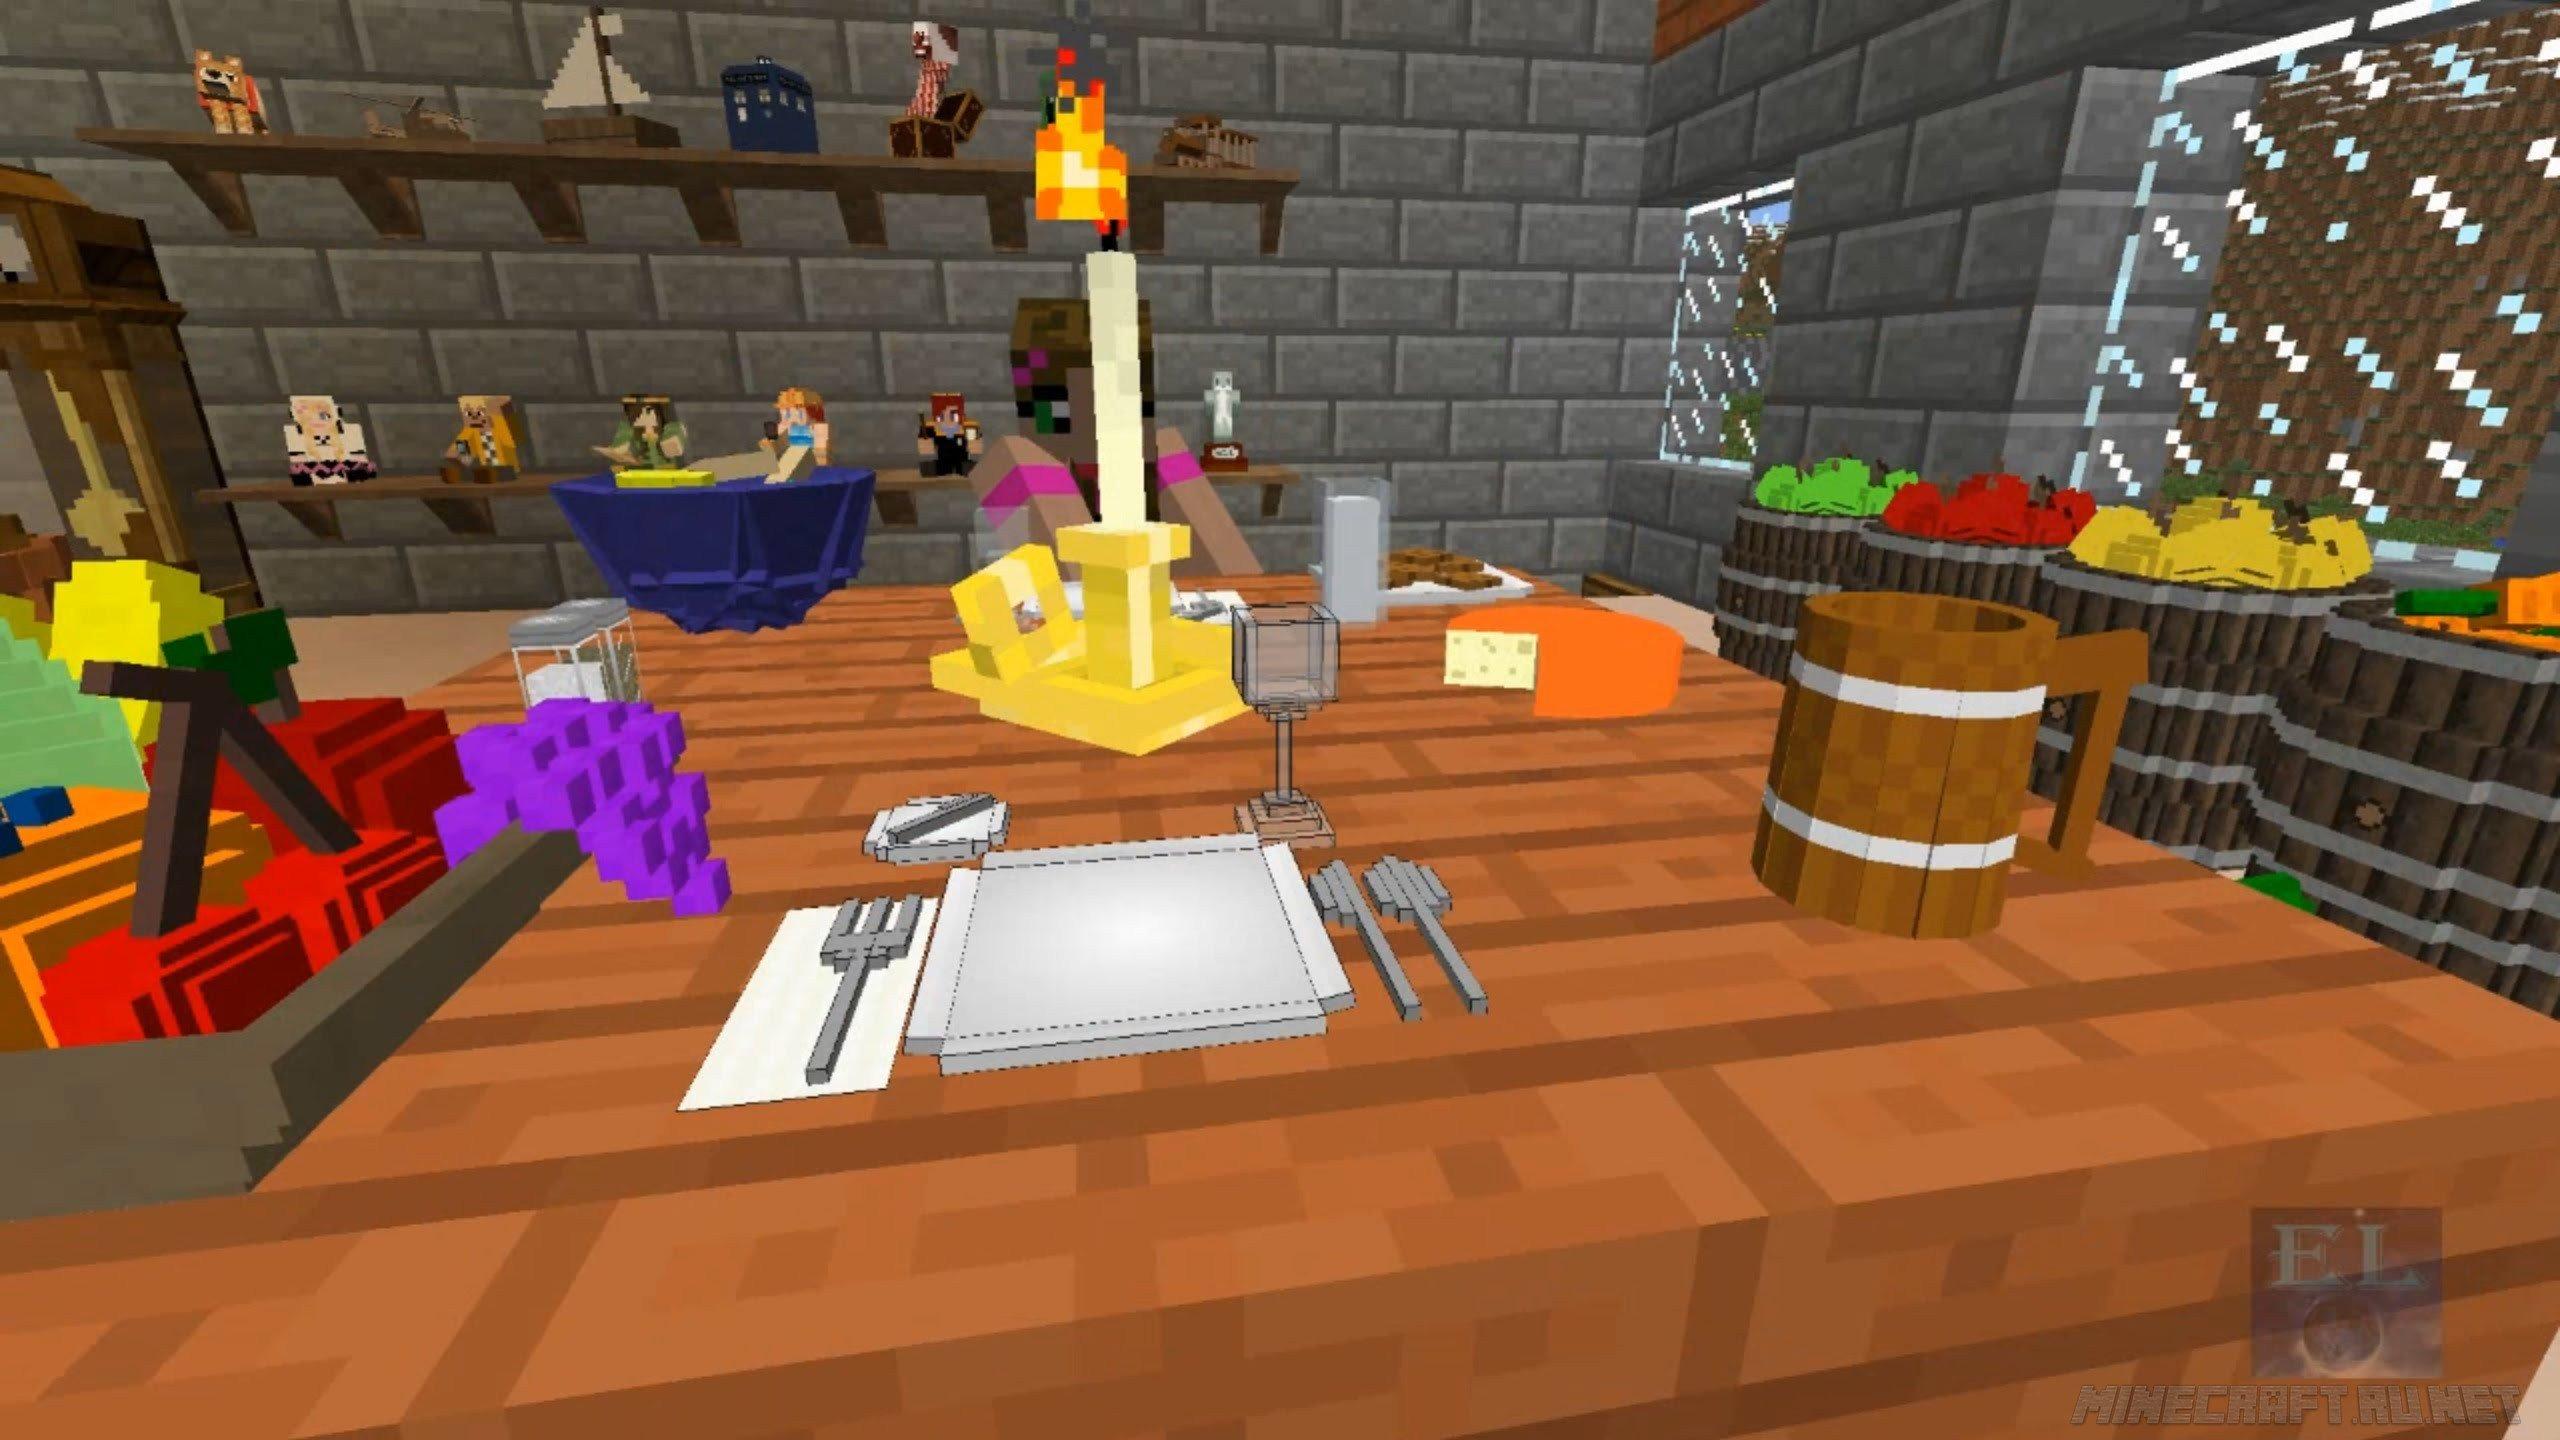 Decocraft V 2 3 2 1 8 9 Mods Mc Pc Net Minecraft Downloads